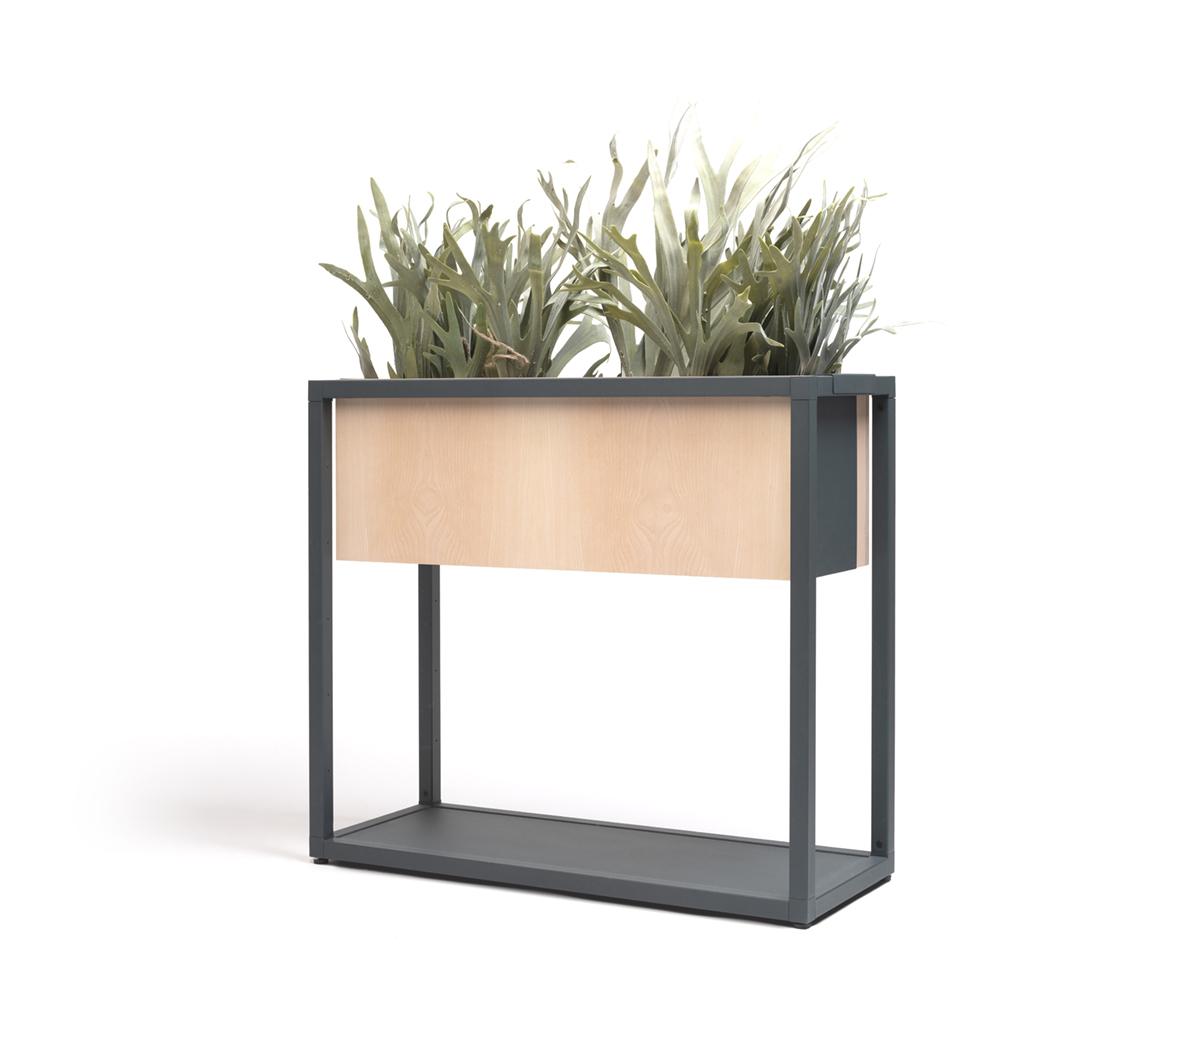 Accessories: Hightower Dry Planter Box